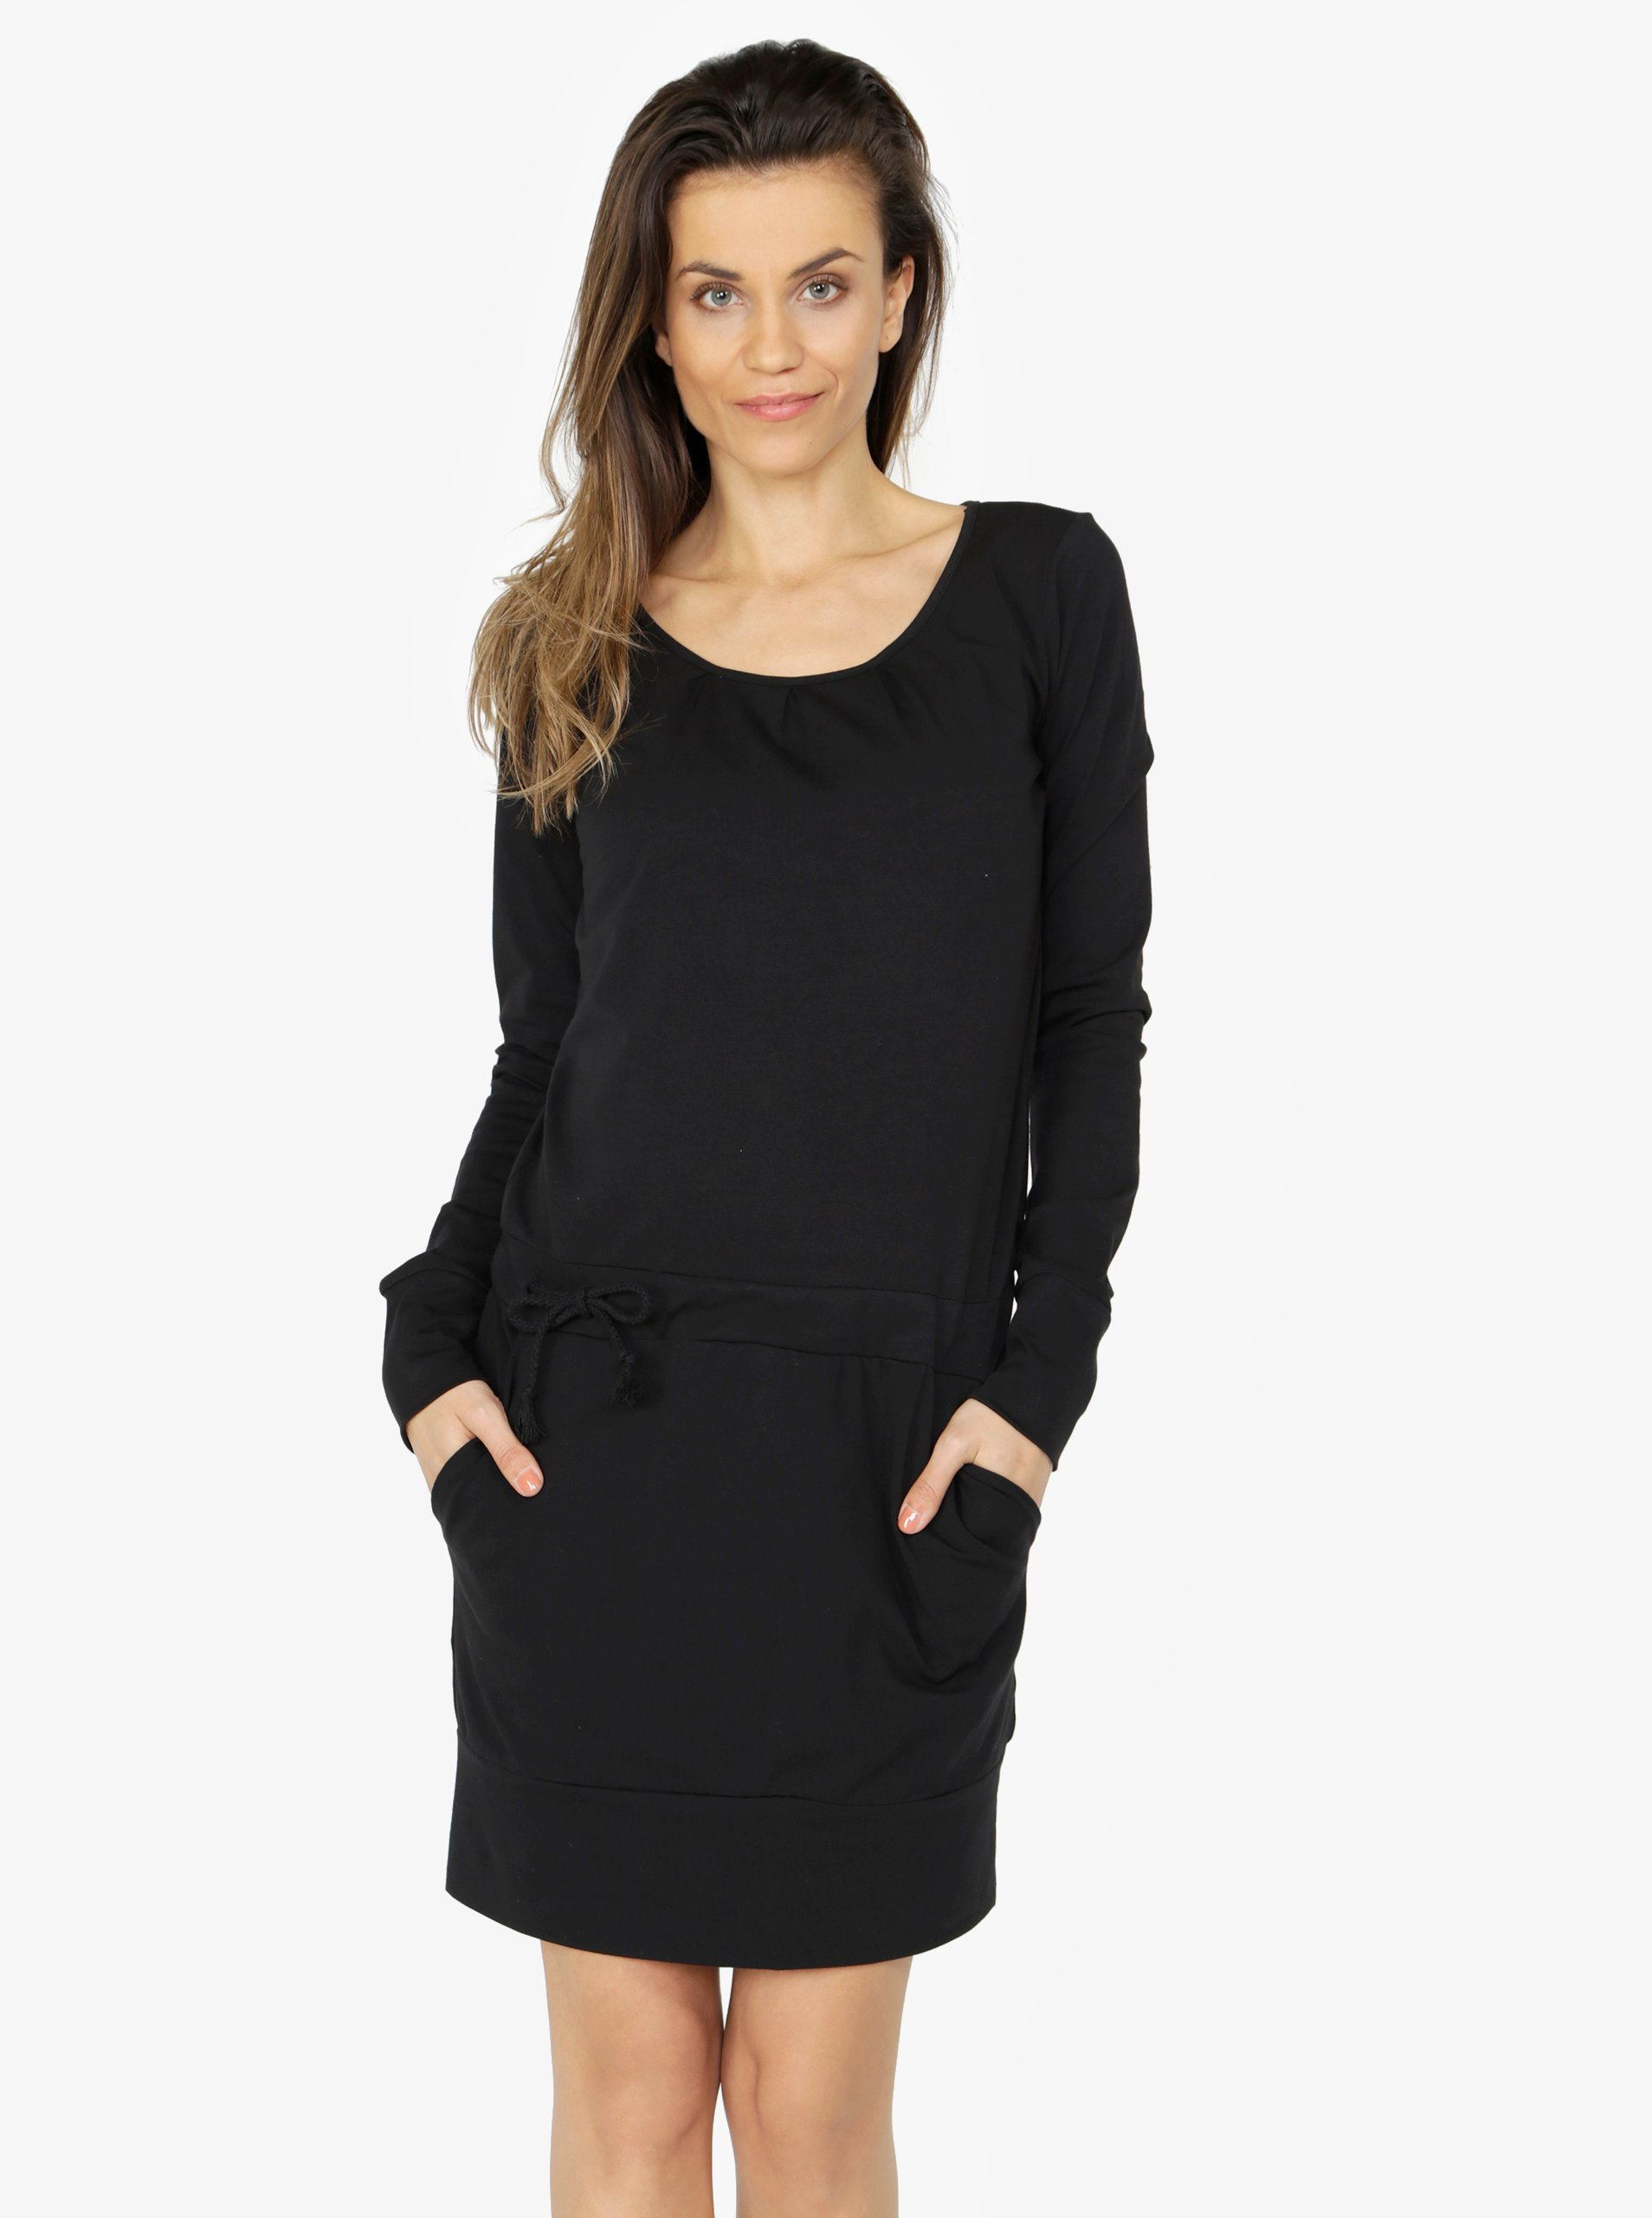 431ba26f45d6 Čierne šaty s dlhým rukávom ZOOT